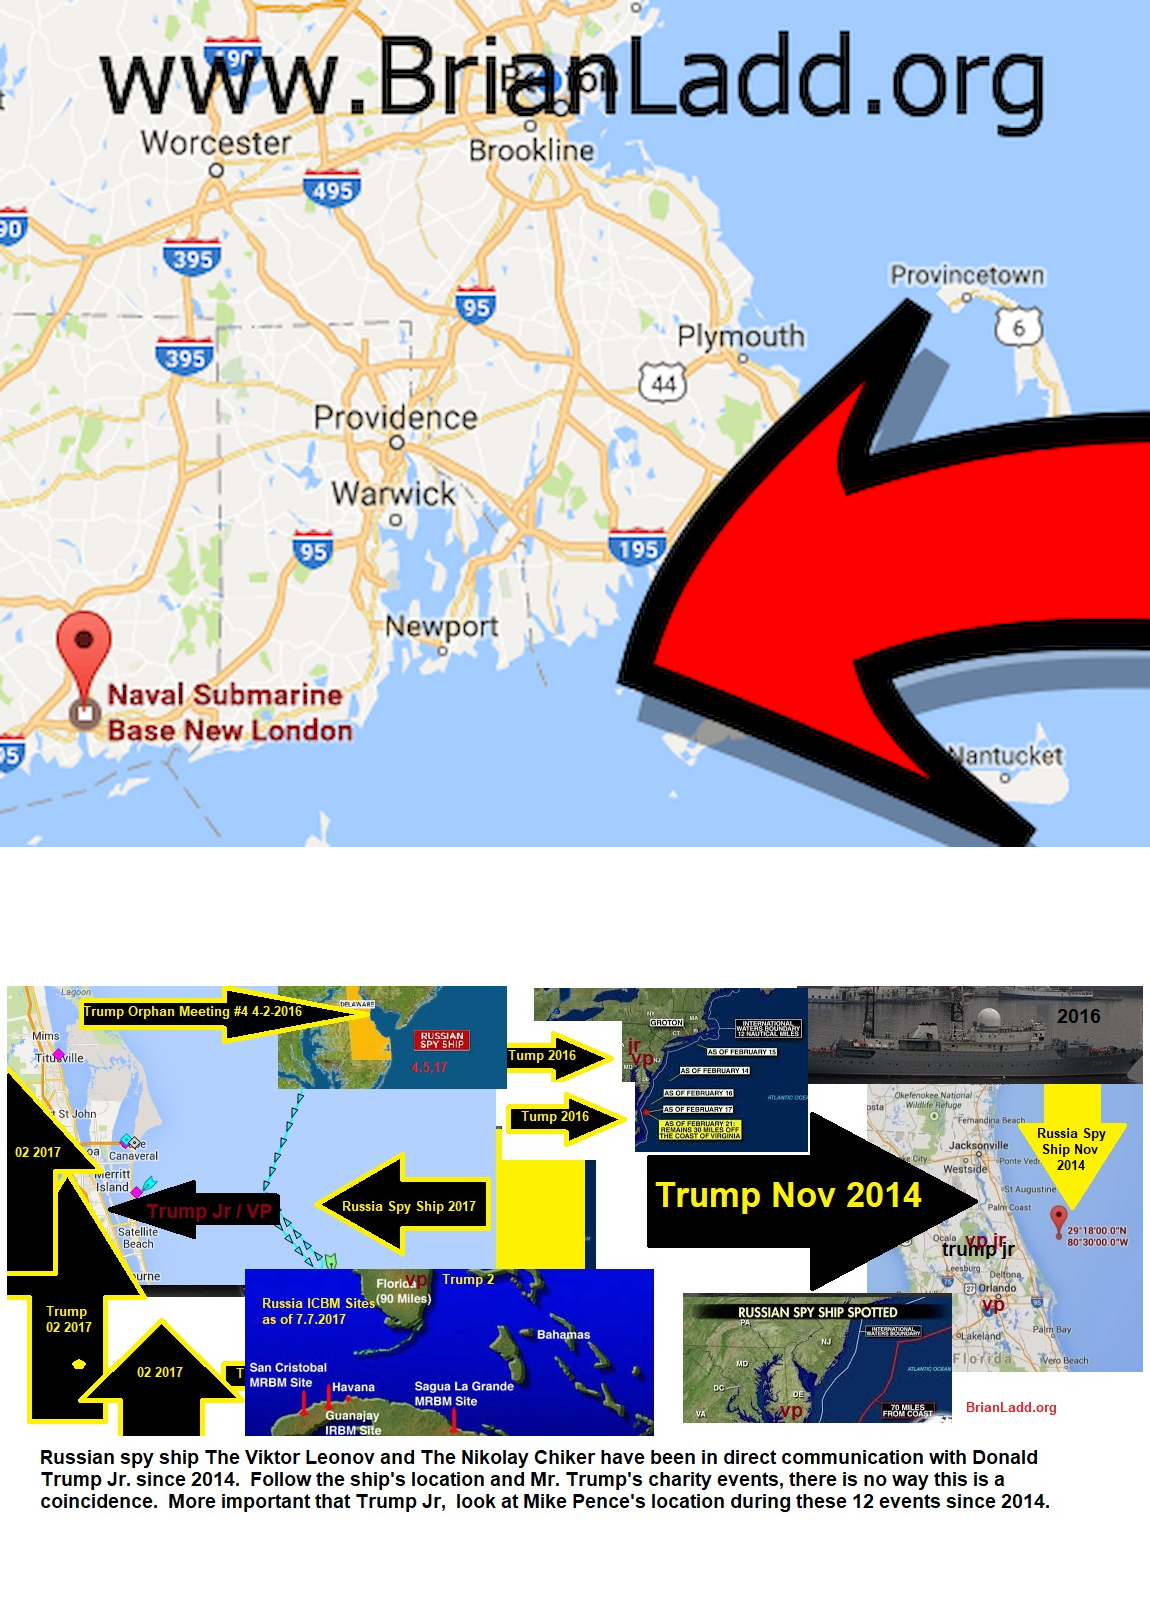 56_russian_spy_ship_new_jersey_Donald_Trump_Jr_Russian_Spy_Sub_and_Ship_2012_to_2017_map_Russian_s.png